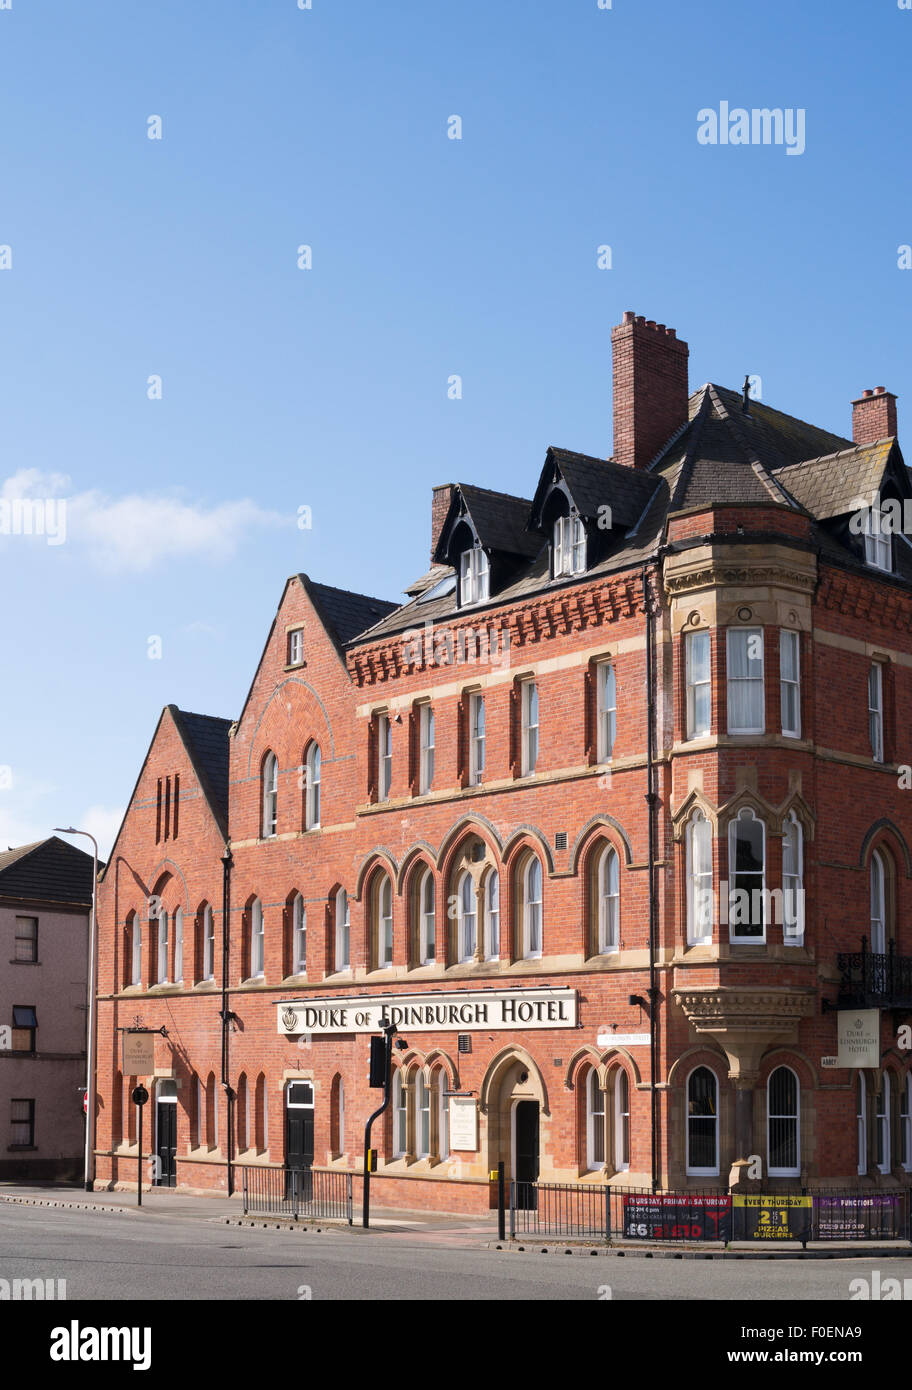 El Duque de Edimburgo Hotel, Barrow-in-Furness, Cumbria, Inglaterra, Reino Unido. Imagen De Stock